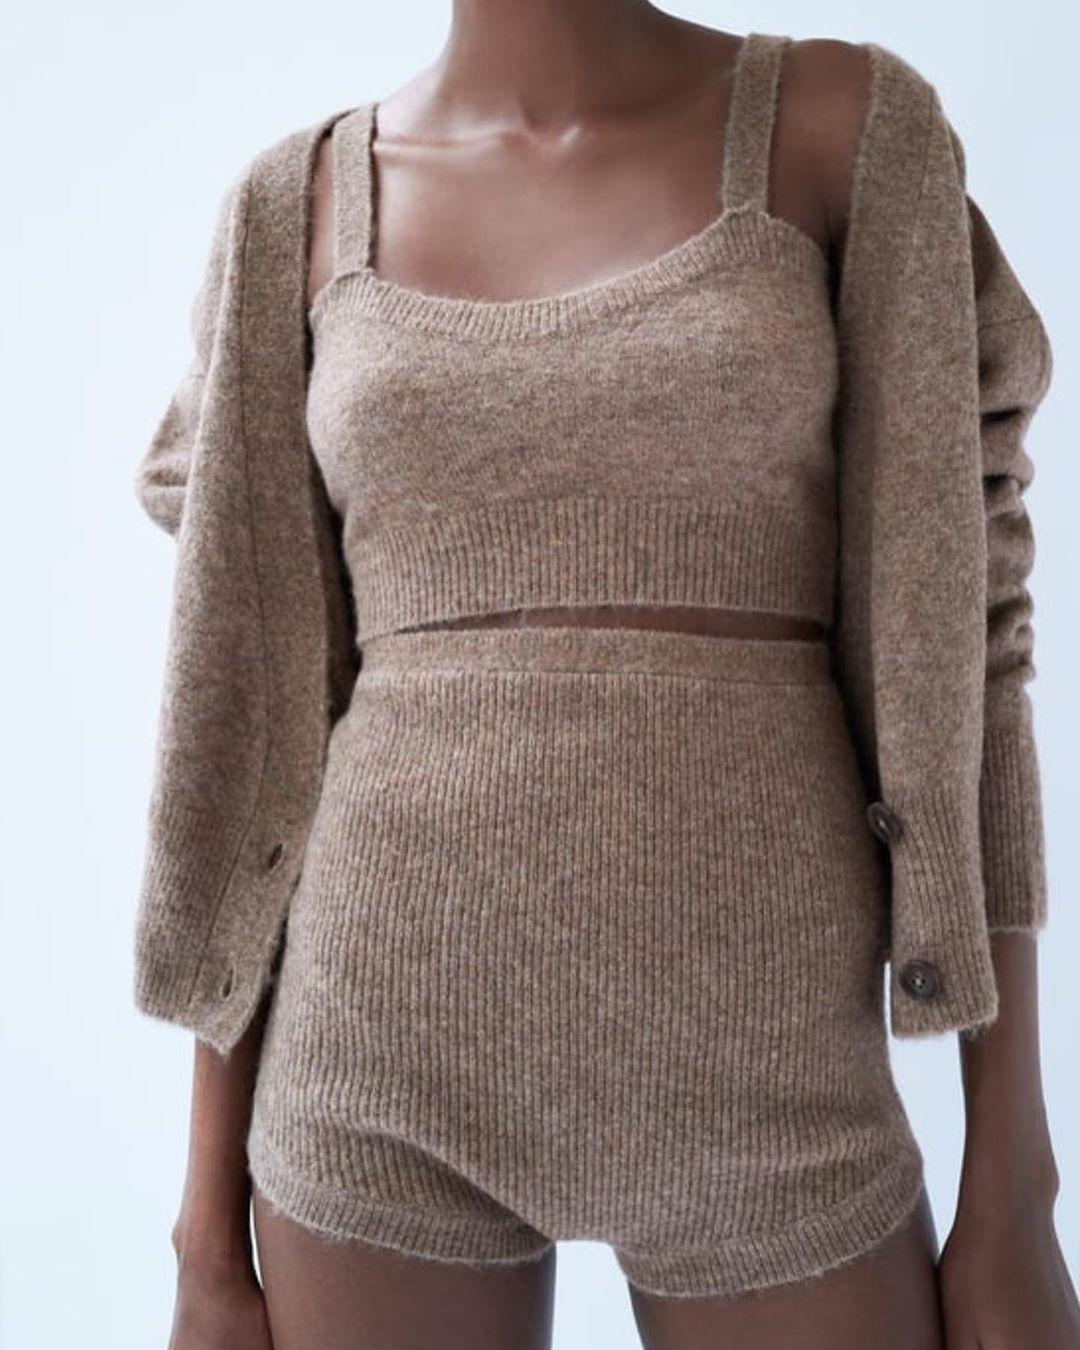 shorts with wool de Zara sur look_by_zara_hm